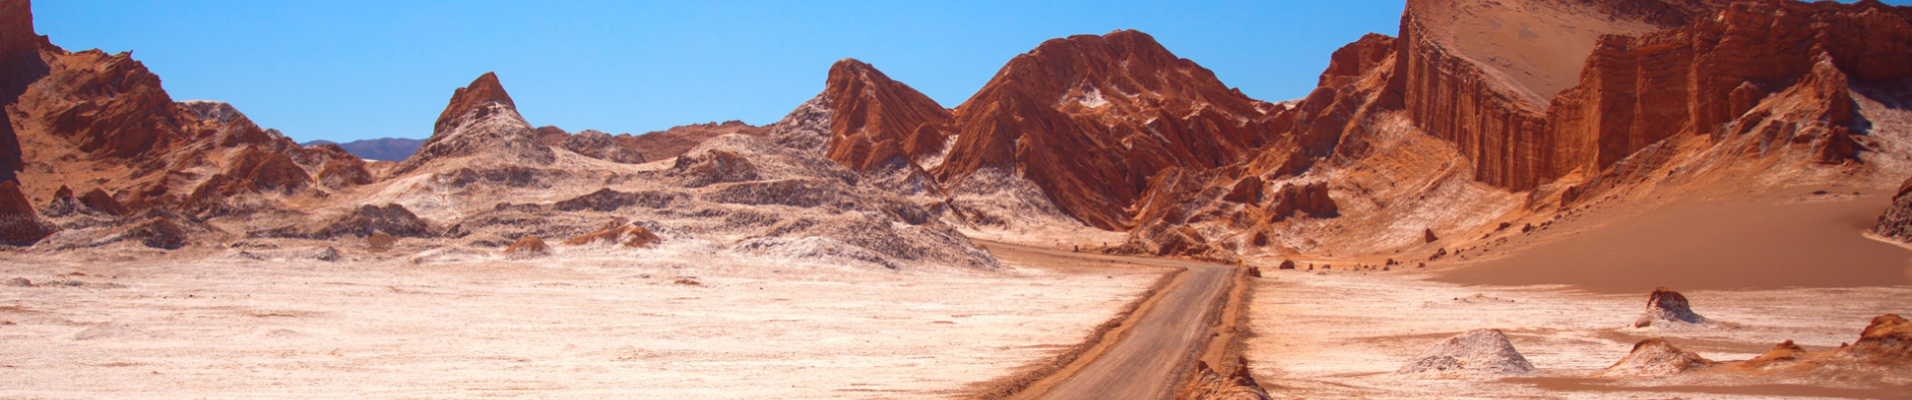 Vallée de la lune, Atacama, Chili